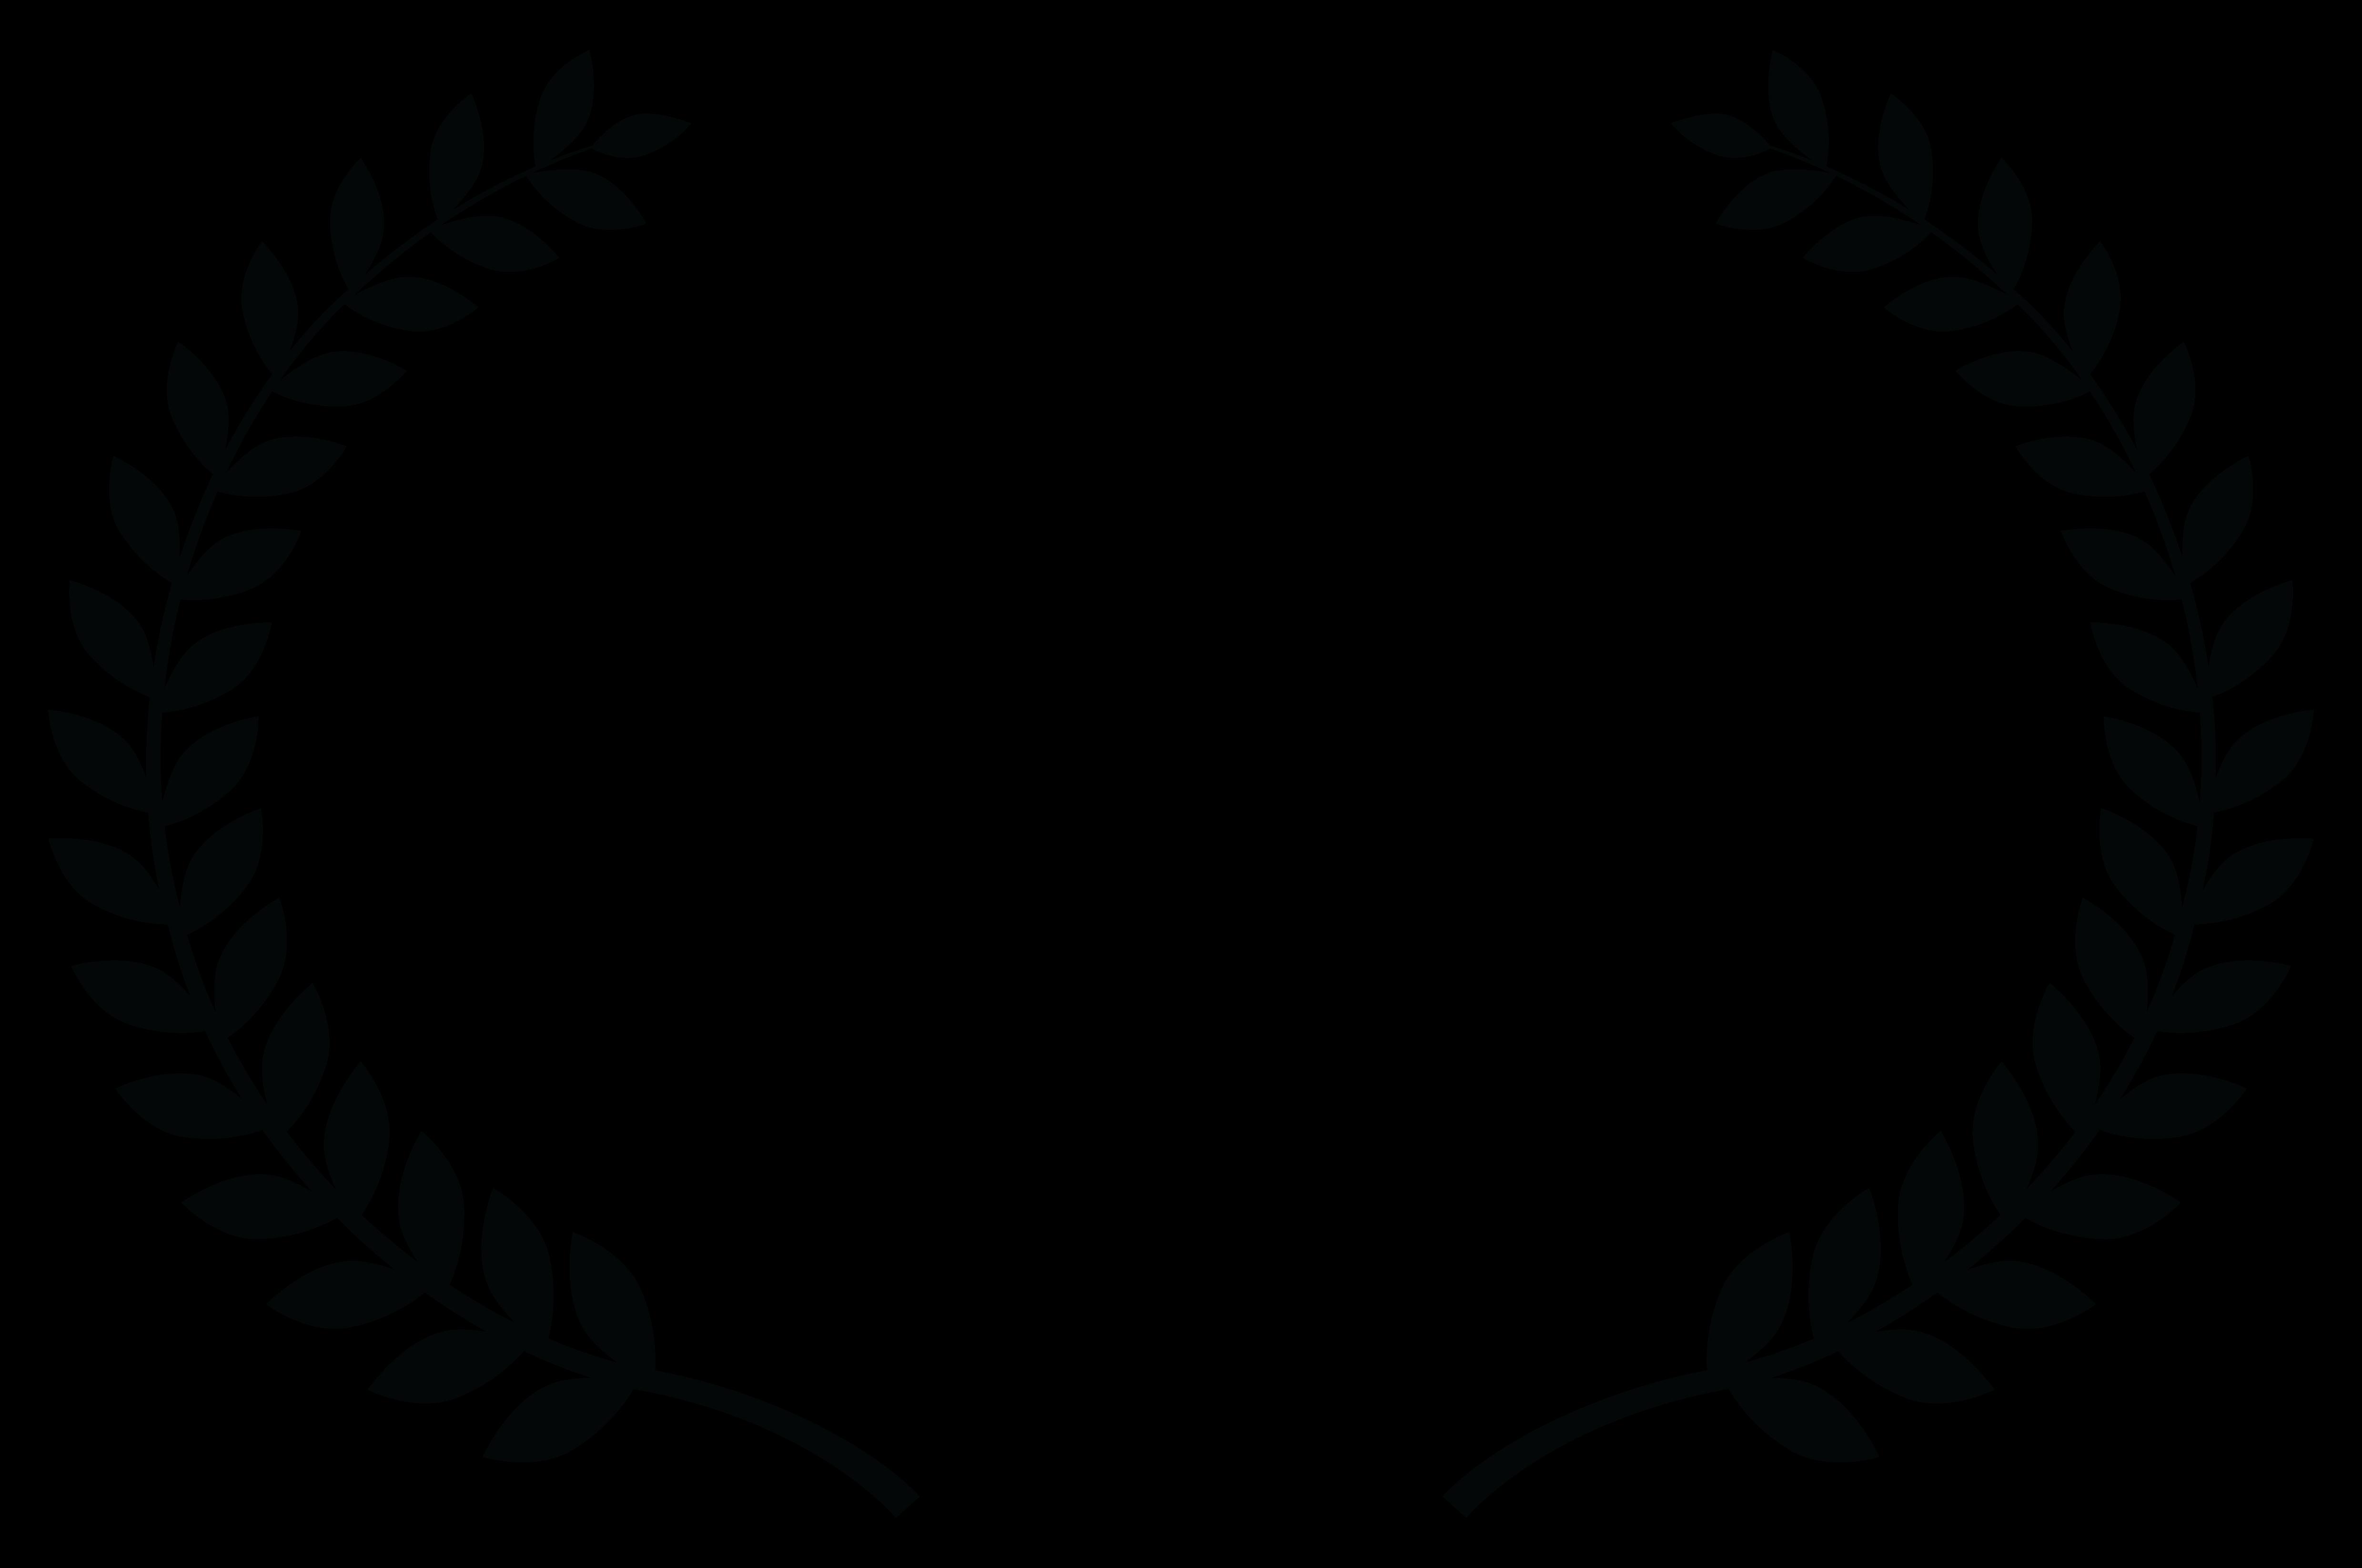 Best Global Shorts - Best Thriller Short